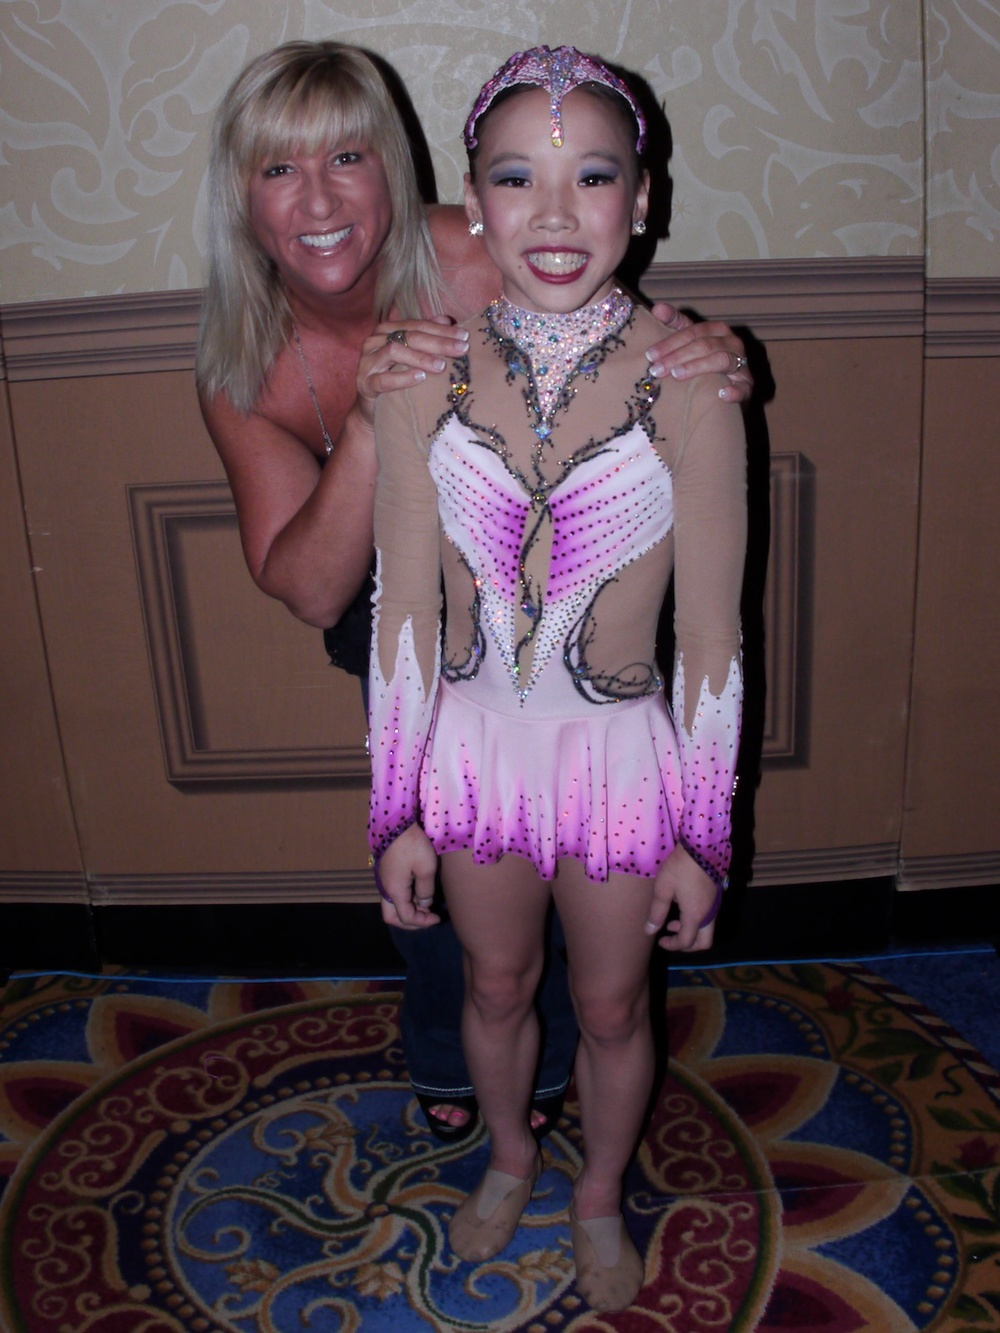 Shae-Lin & Brynne Becker